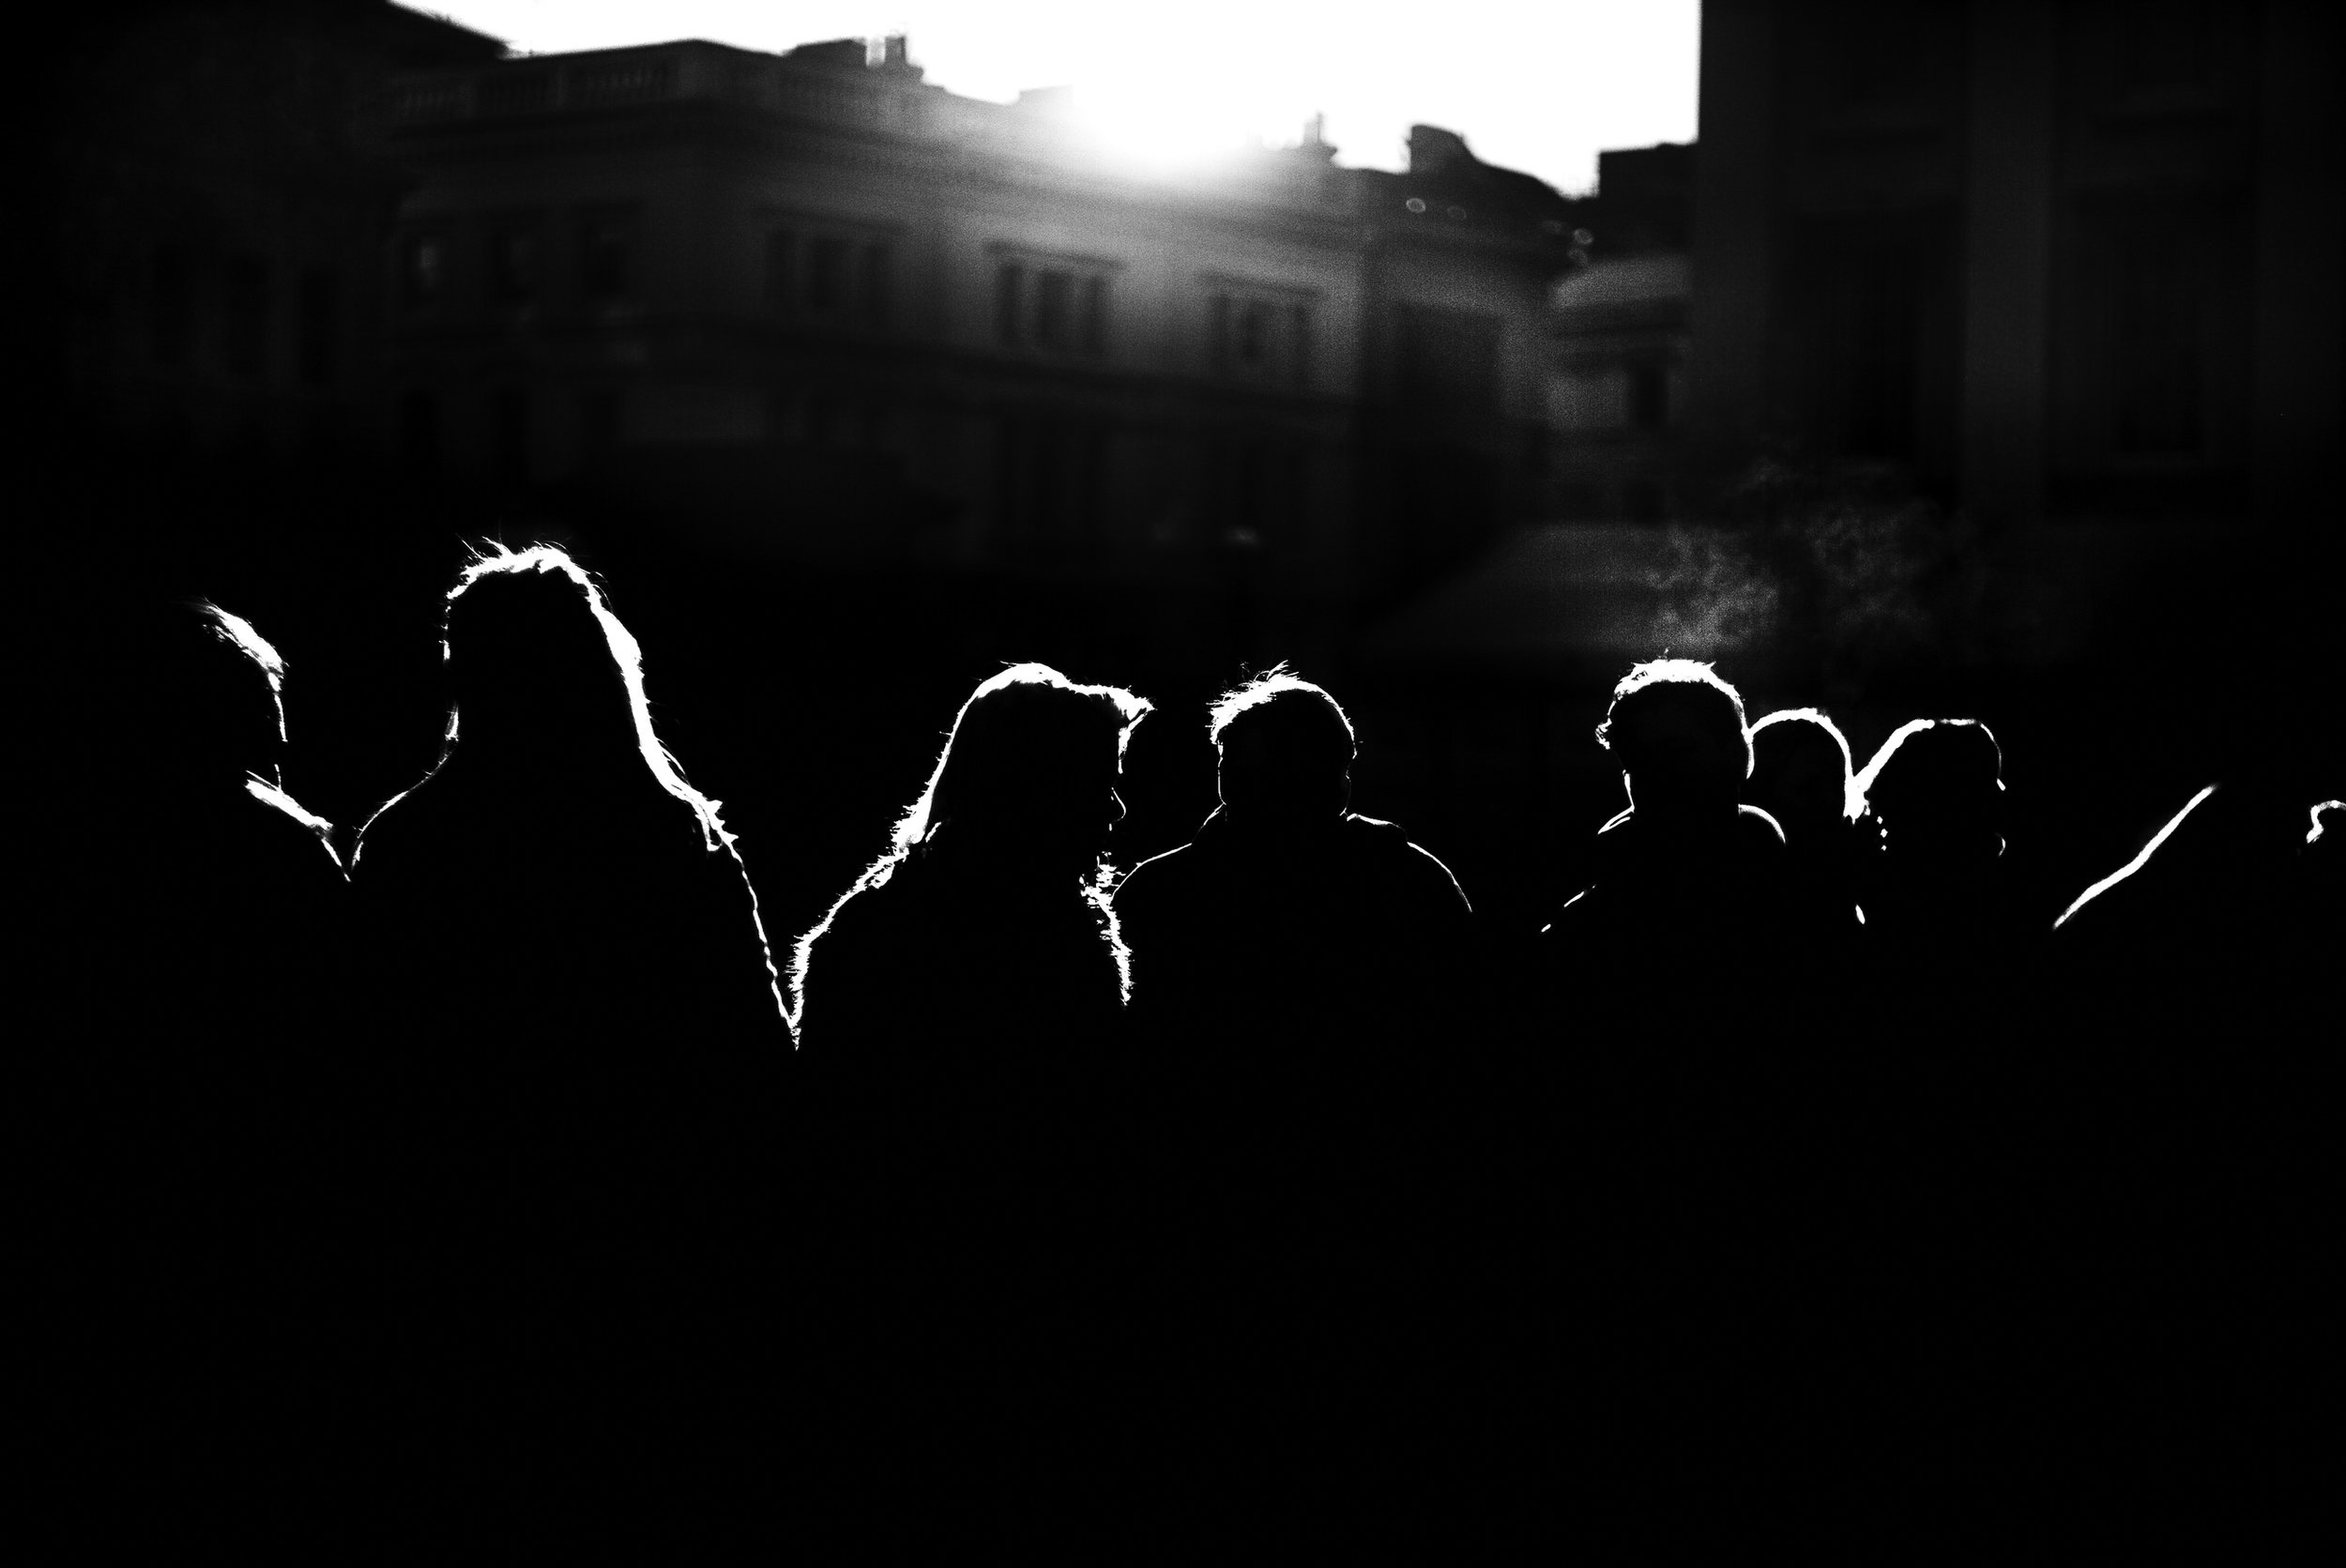 Alan Schaller - London Street Photographer - Metropolis6.jpg